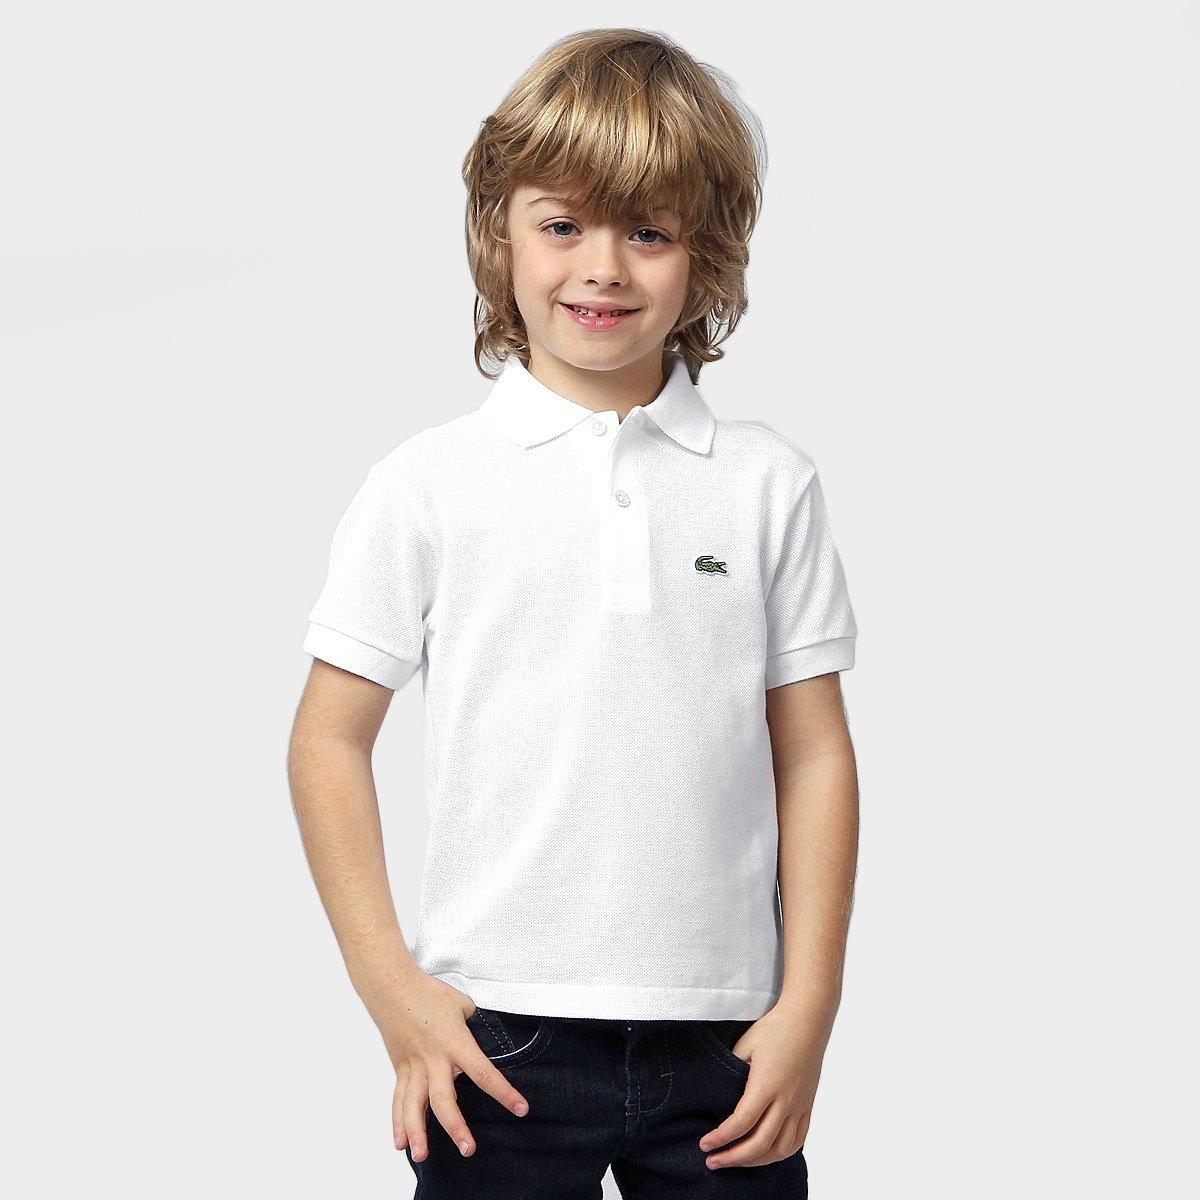 0298709ab4e2c Camisa Polo Lacoste Piquet Infantil - Compre Agora